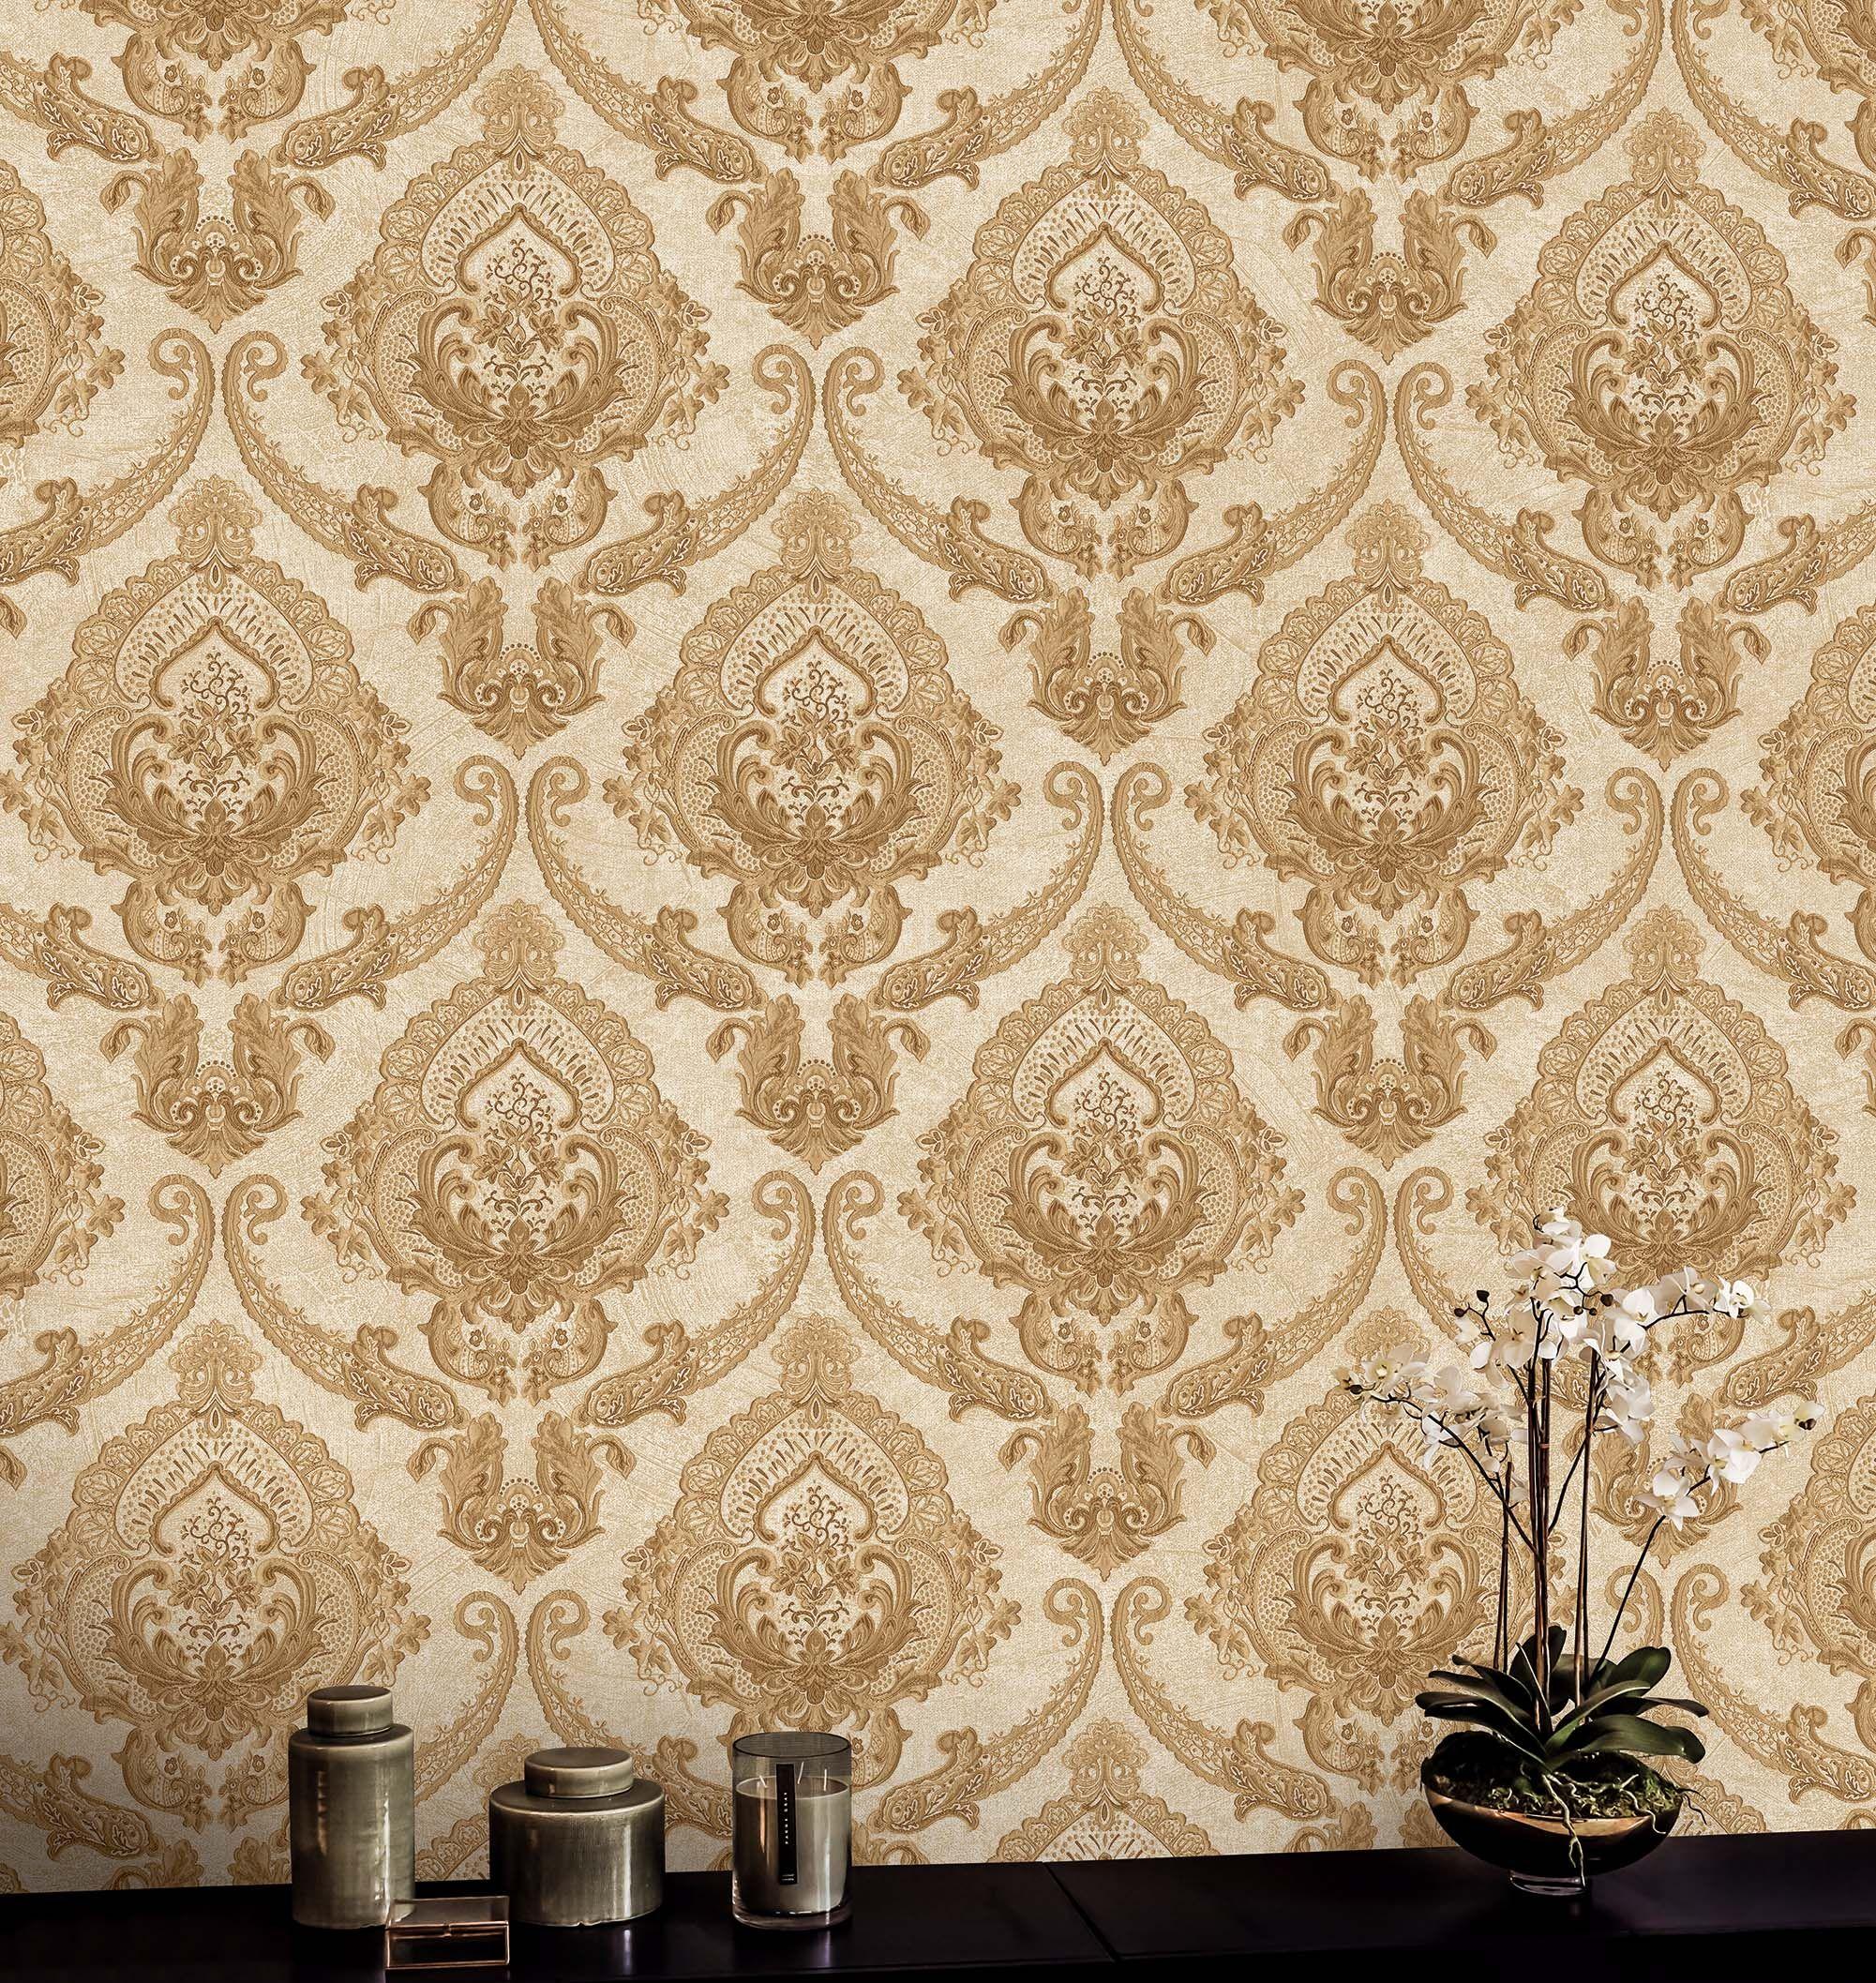 wallpaper for bedroom walls aarcee wallpapers newdelhi gurgaon 2001x2115